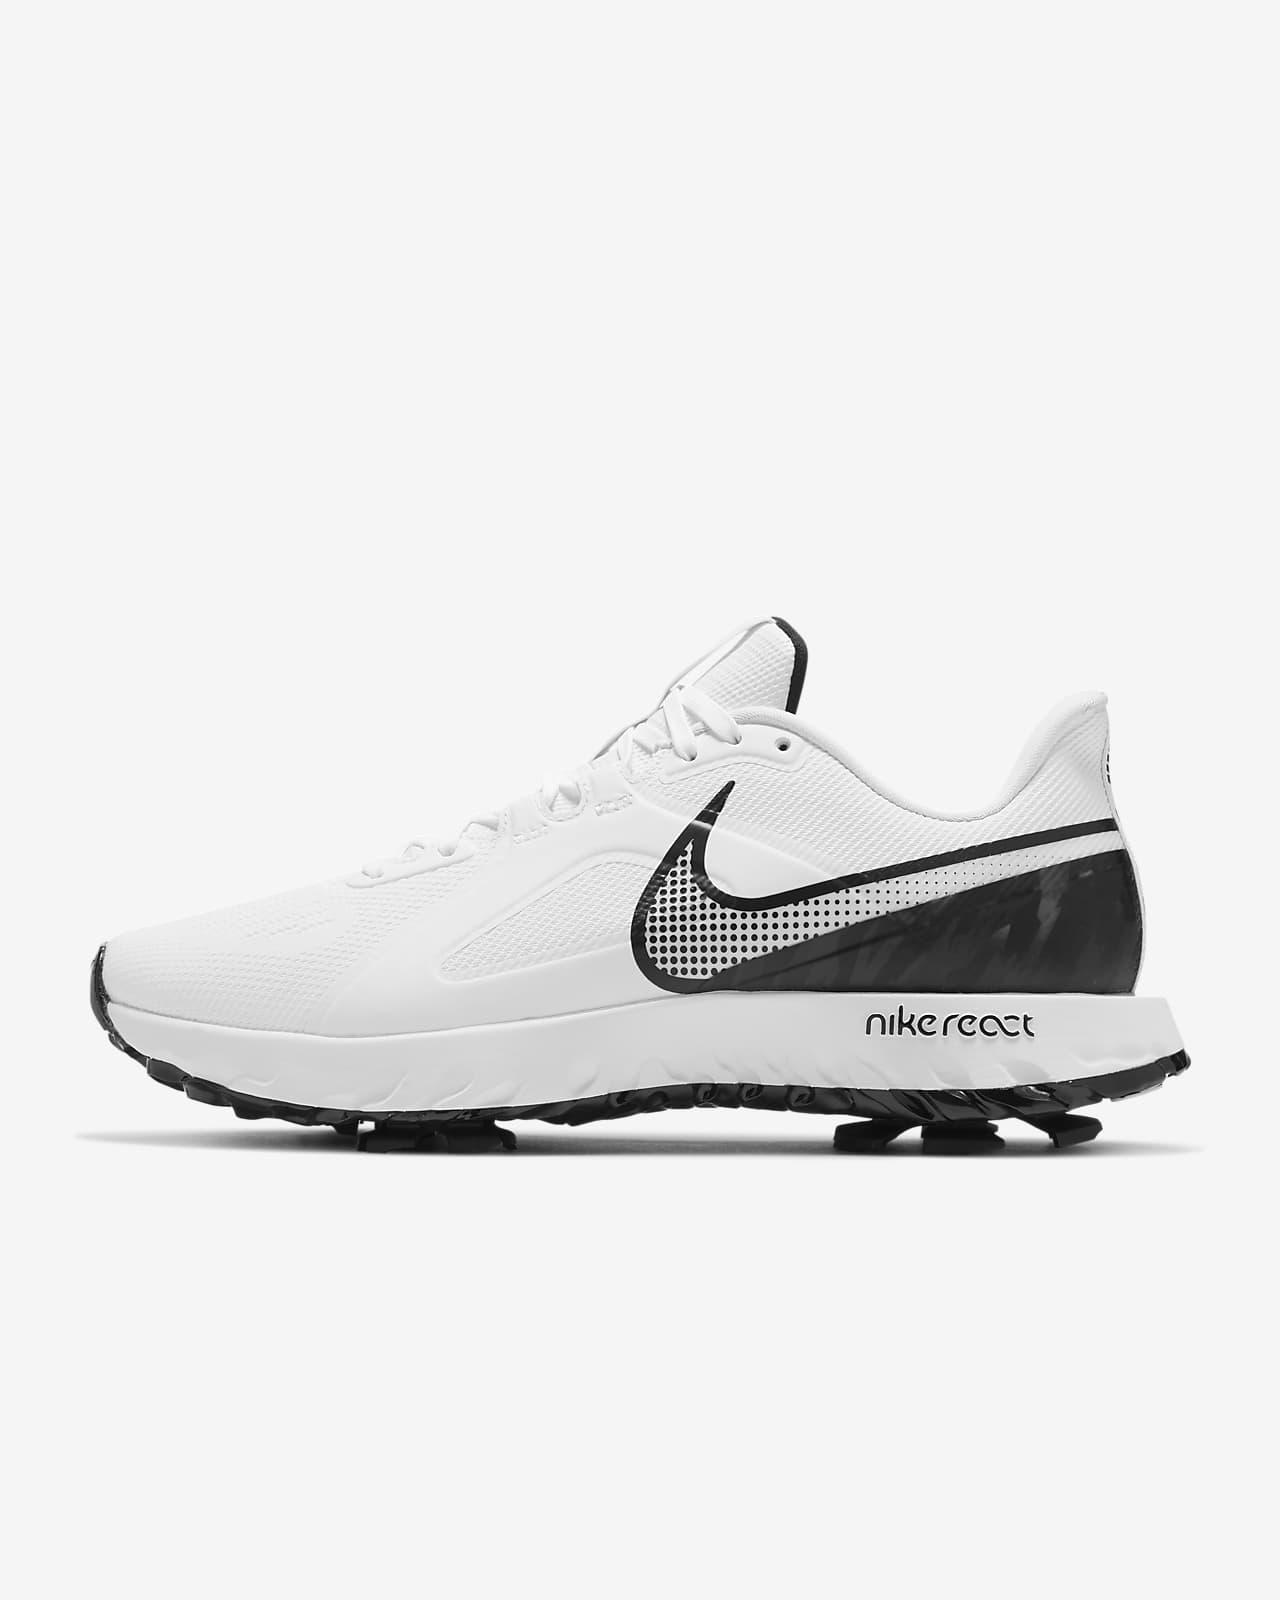 Nike React Infinity Pro Golf Shoe (Wide)